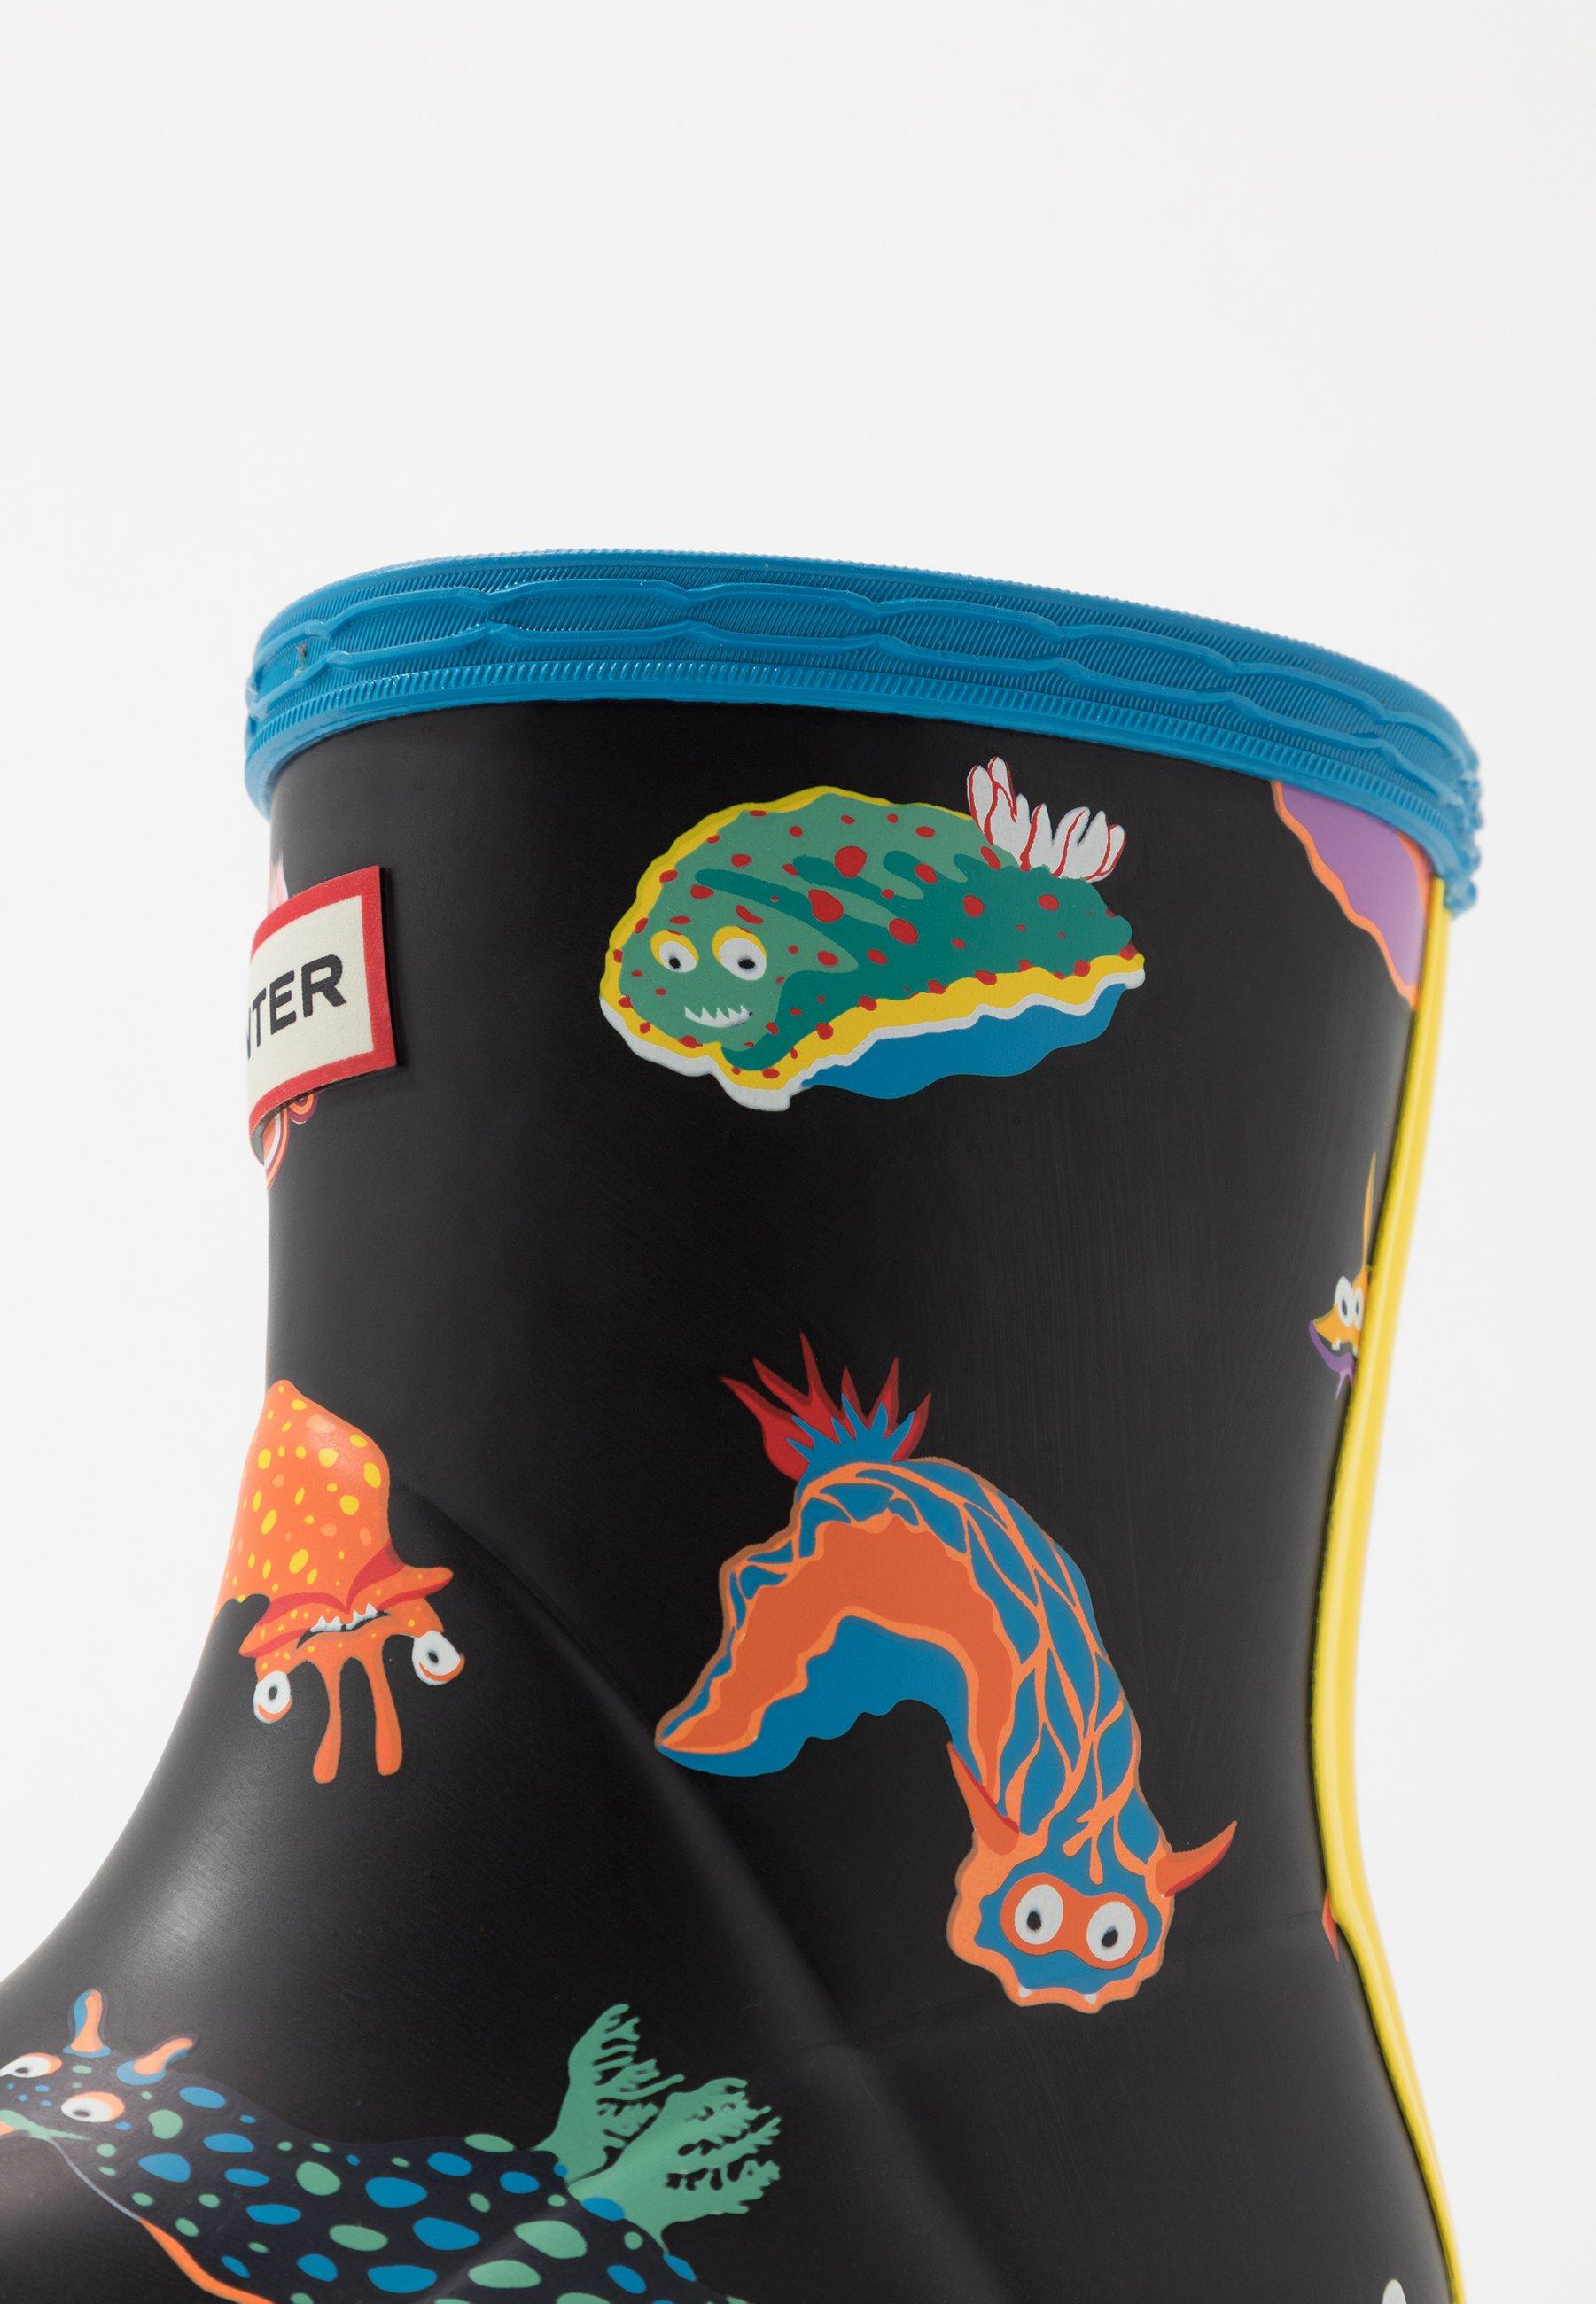 Particular Cheapest Hunter ORIGINAL KIDS FIRST CLASSIC SEA MONSTER PRINT - Wellies - blue bottle   kids shoes 2020 tqguj